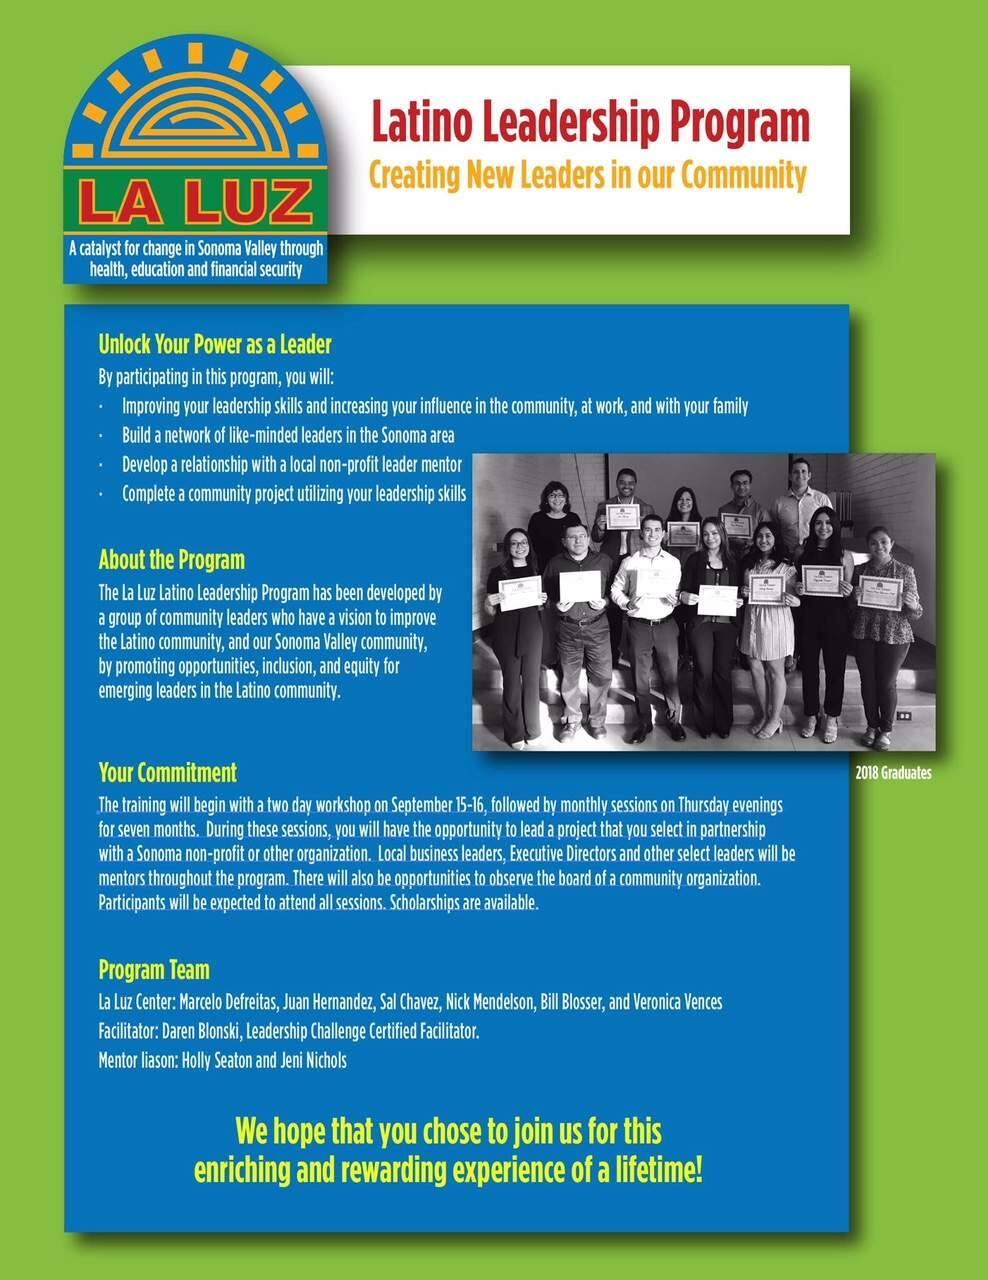 The program flyer.